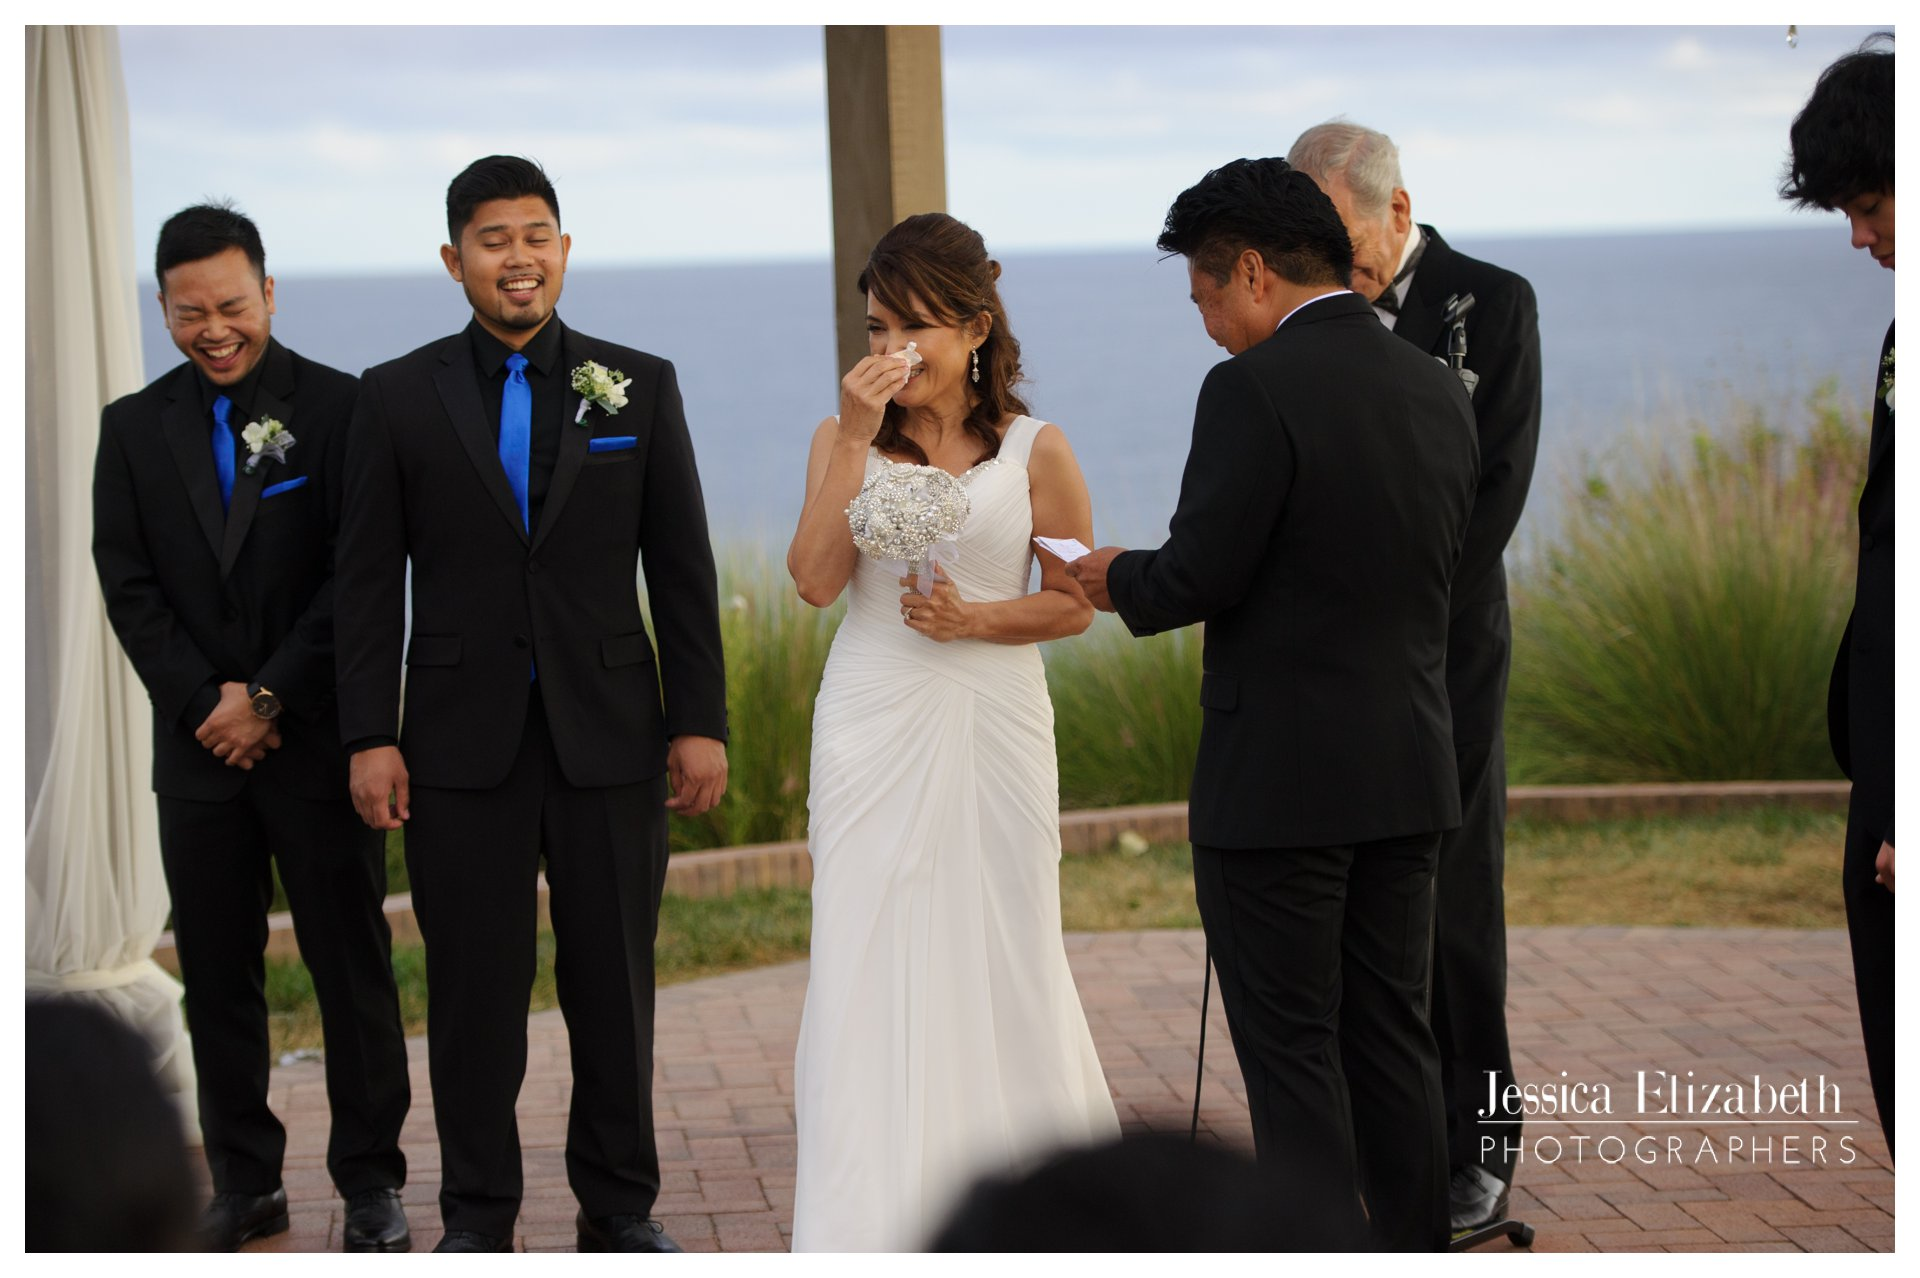 18-Terranea-Palos-Verdes-Wedding-Photography-by-Jessica-Elizabeth-w.jpg